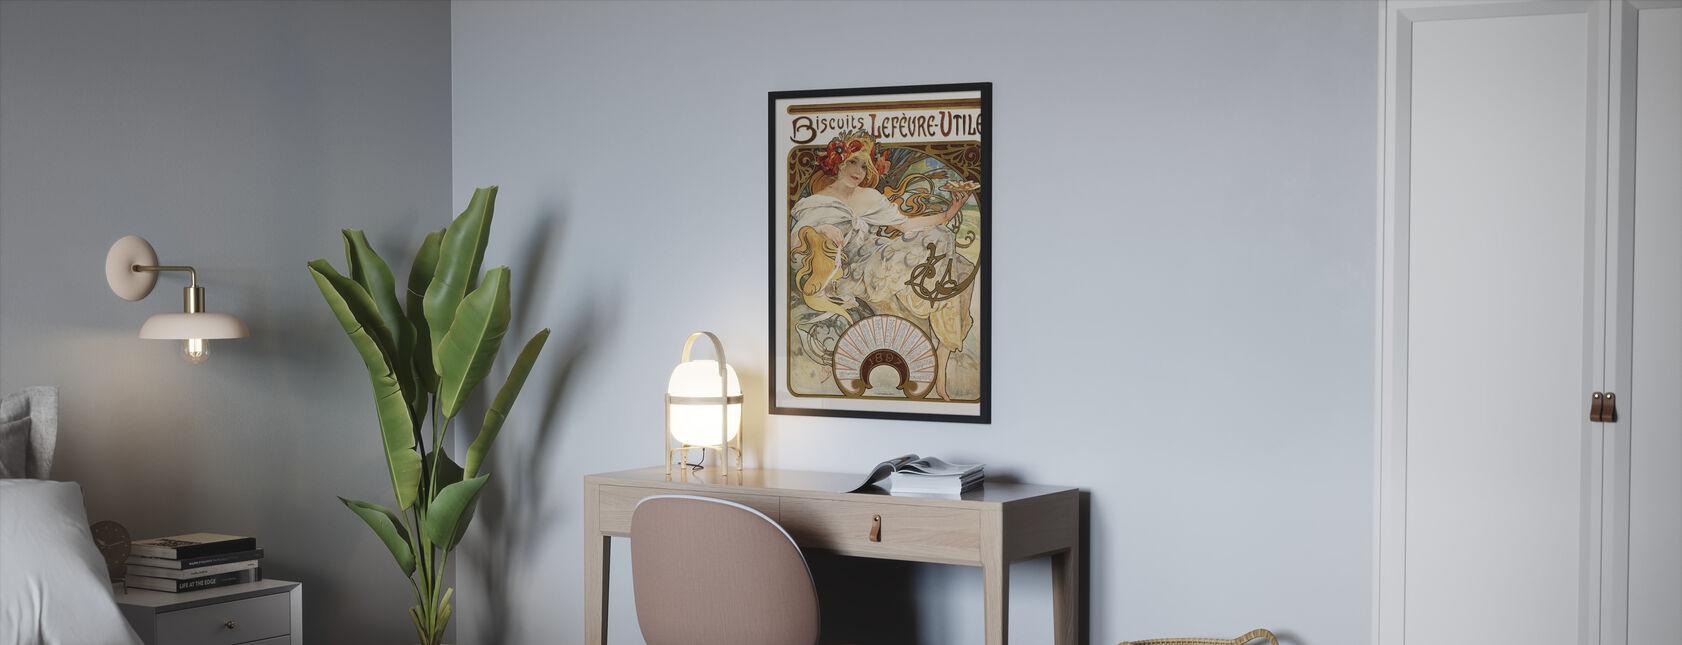 Alphonse Mucha - Biscuits Lefévre-Utilie - Kehystetty kuva - Makuuhuone